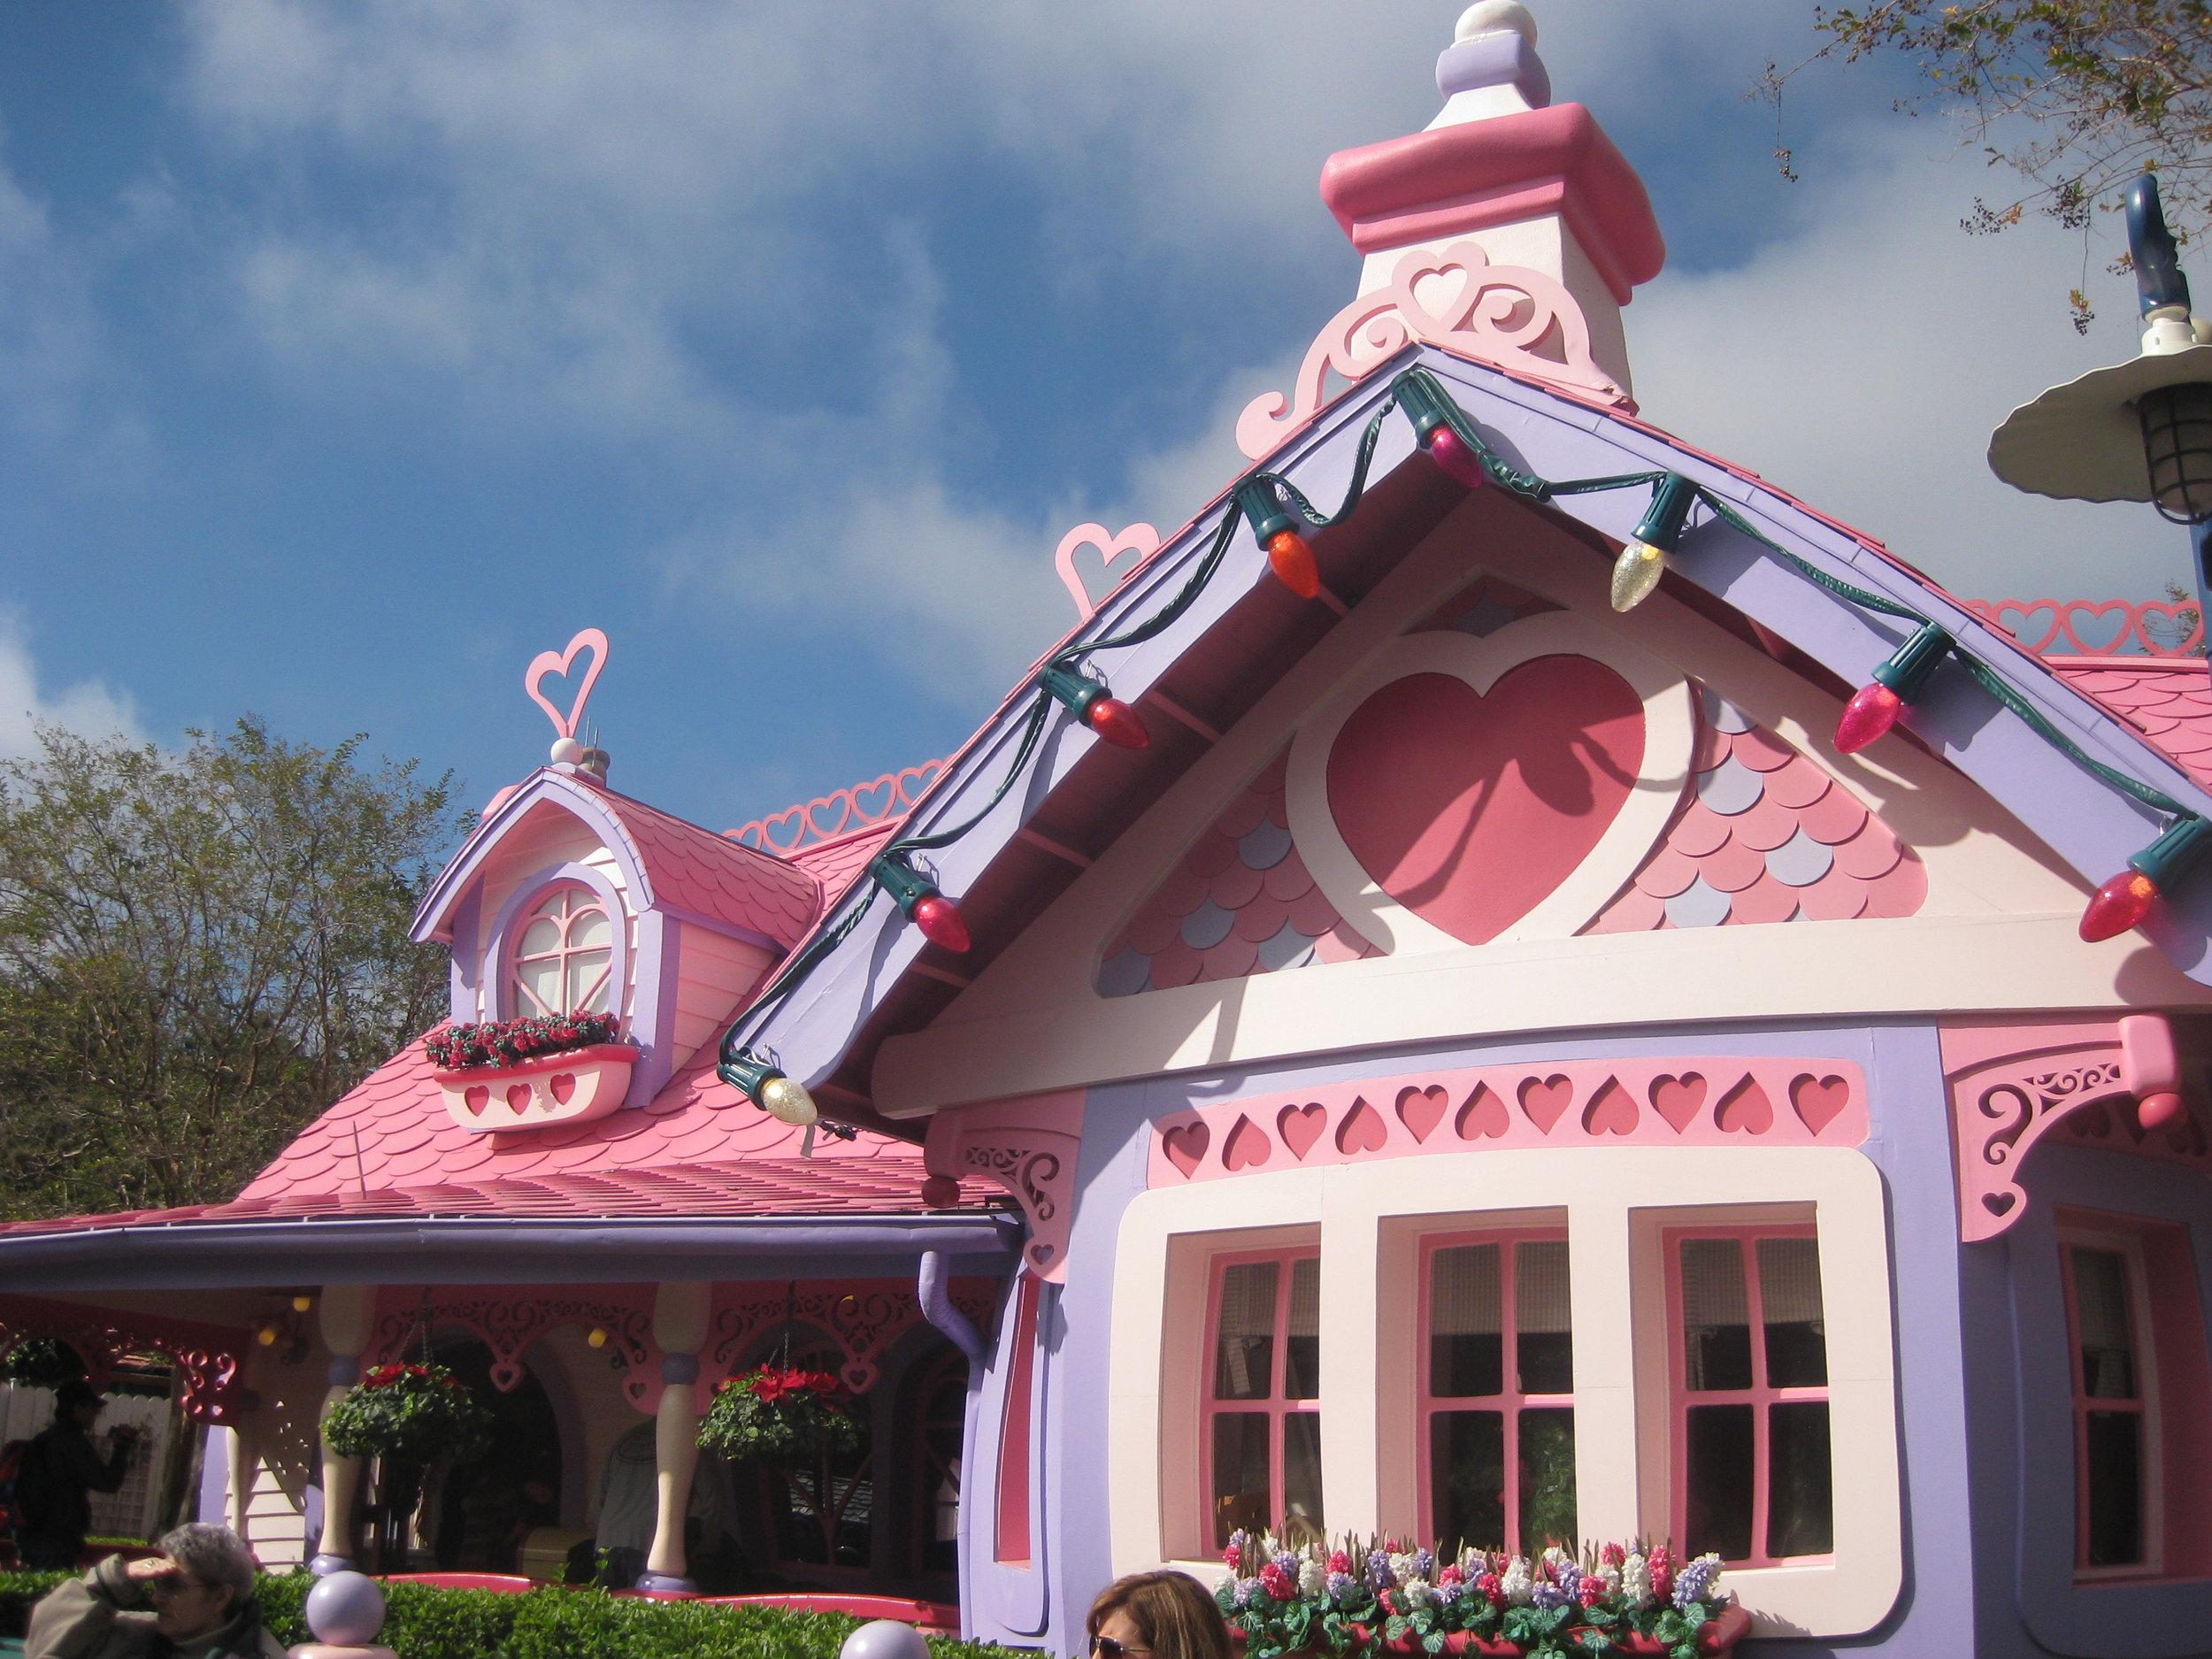 Christmas 2010 at Disney World